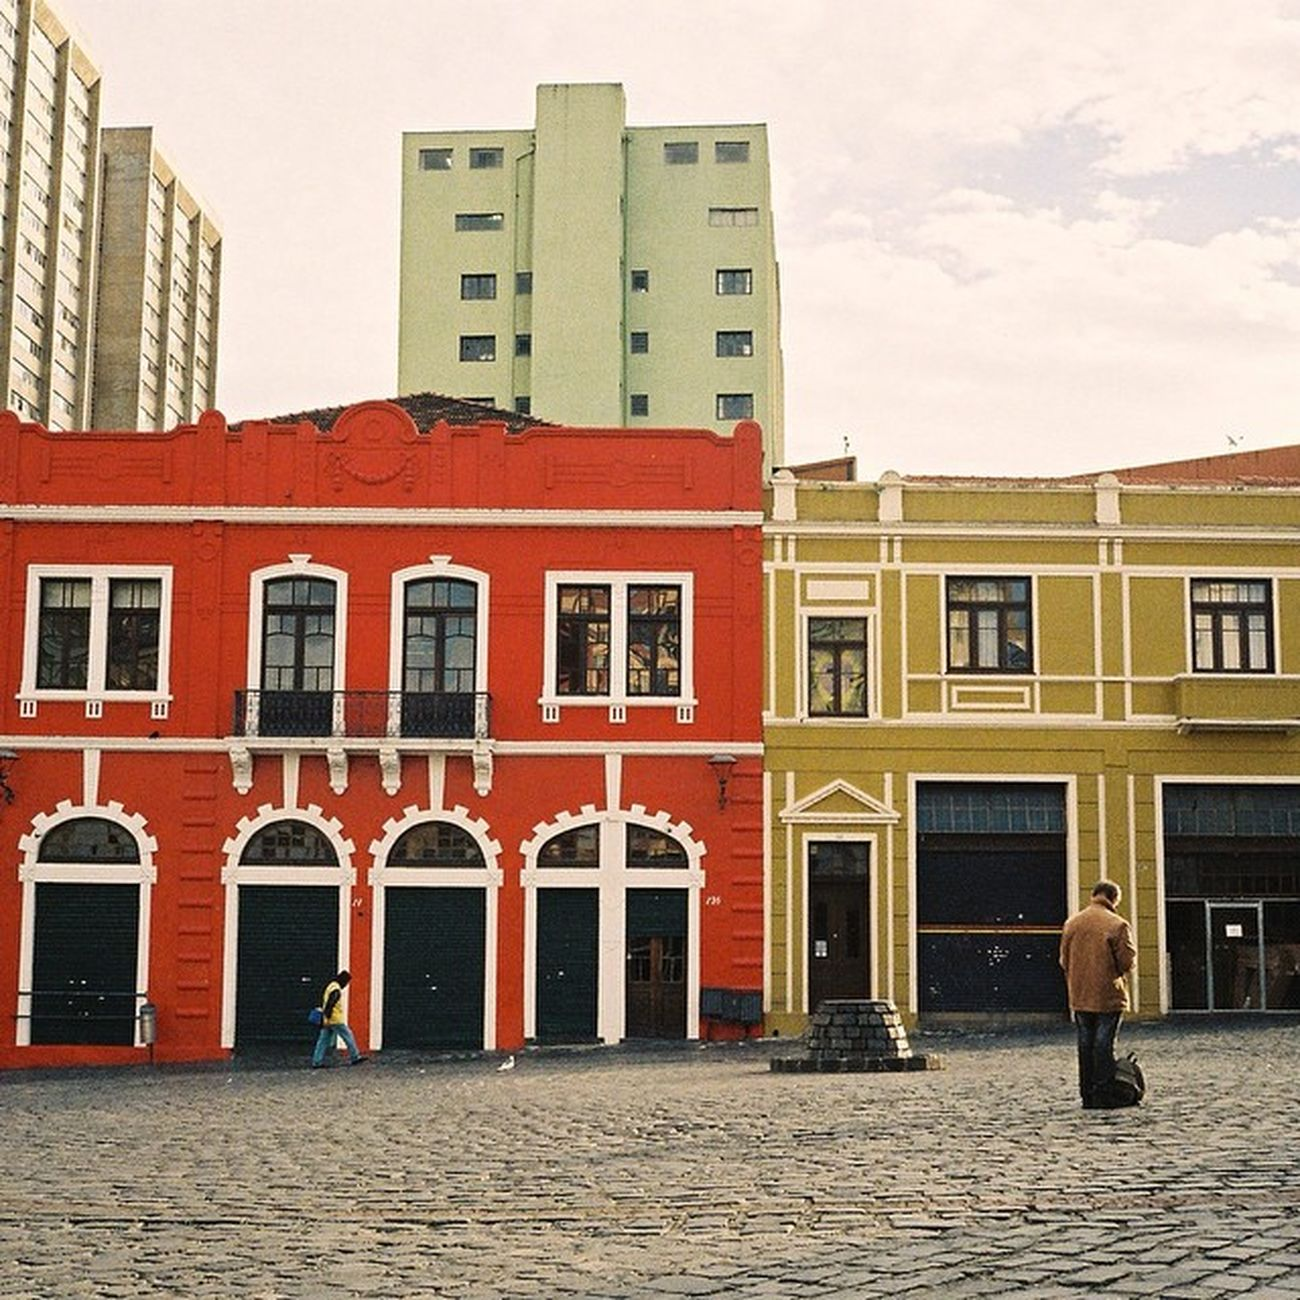 Cymera Cymeraapp VSCO Vscocam T3 Contax Brasil Curitiba Colorful People